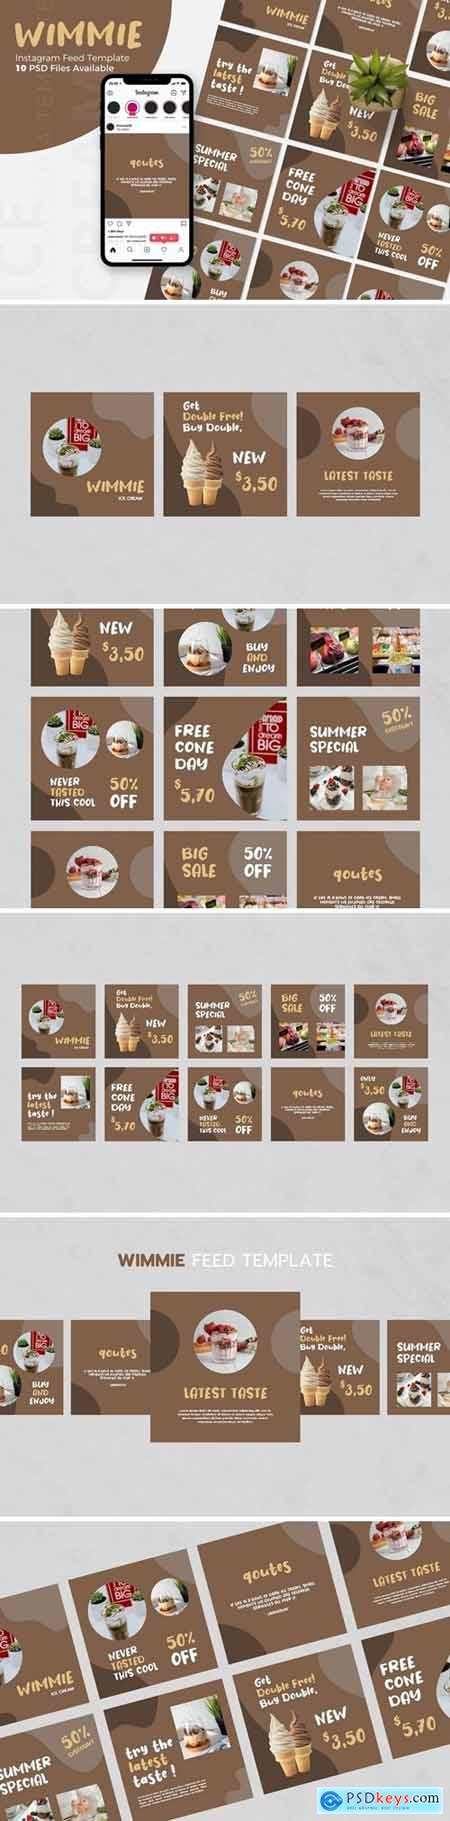 Wimmie - Ice Cream Instagram Post Template